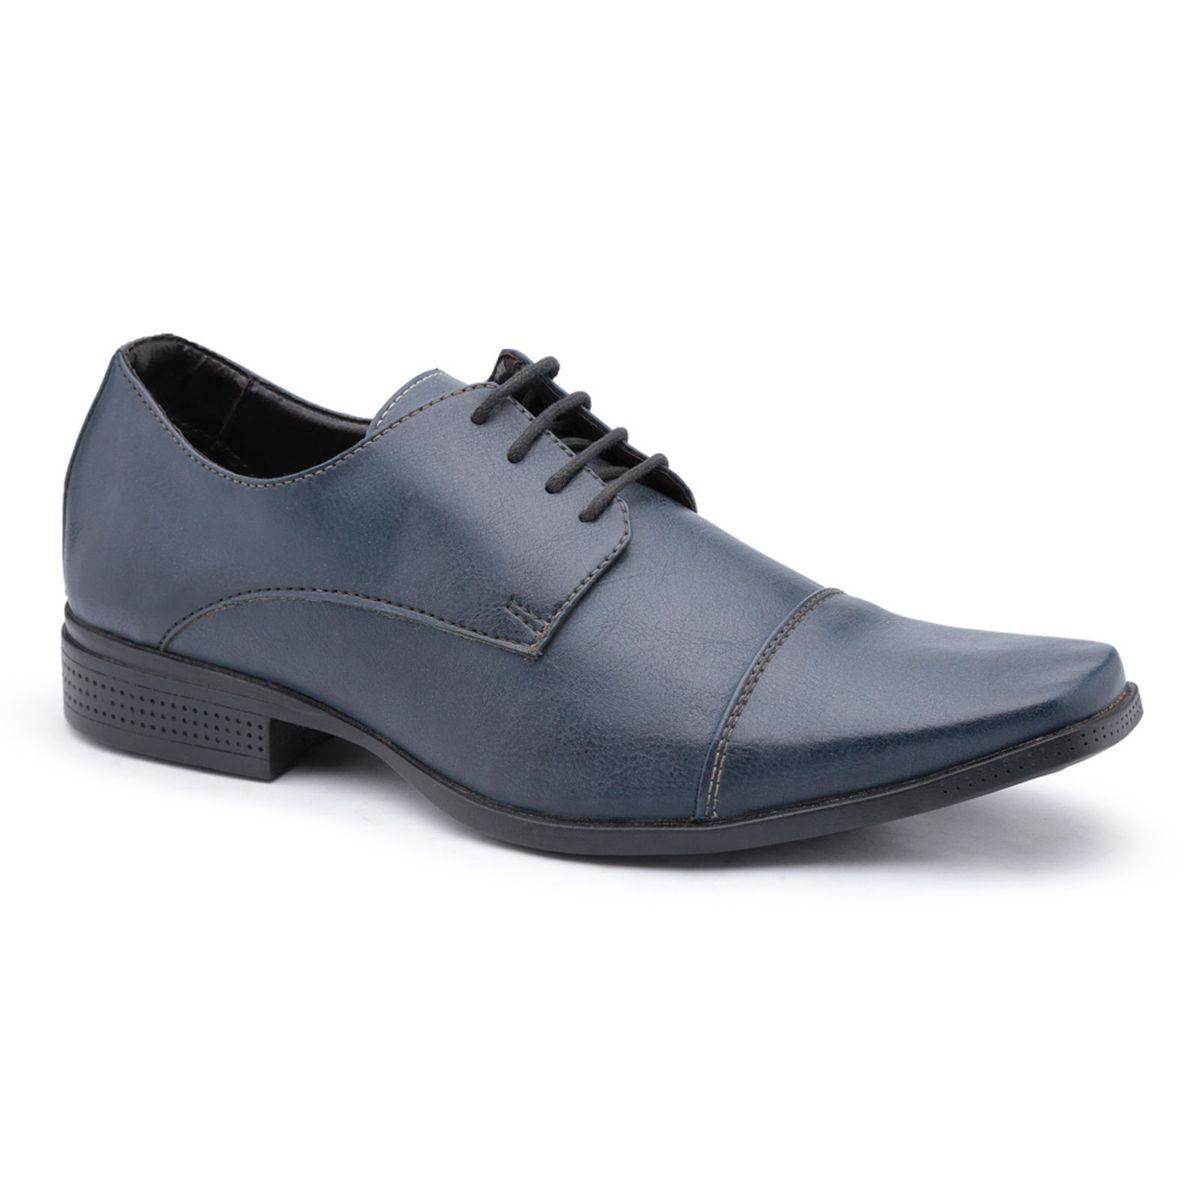 752ea00b2 Sapato Social Masculino Ruggero em Couro Ecológico Azul   Sapato Masculino  Ruggero Nunca Usado 27731358   enjoei